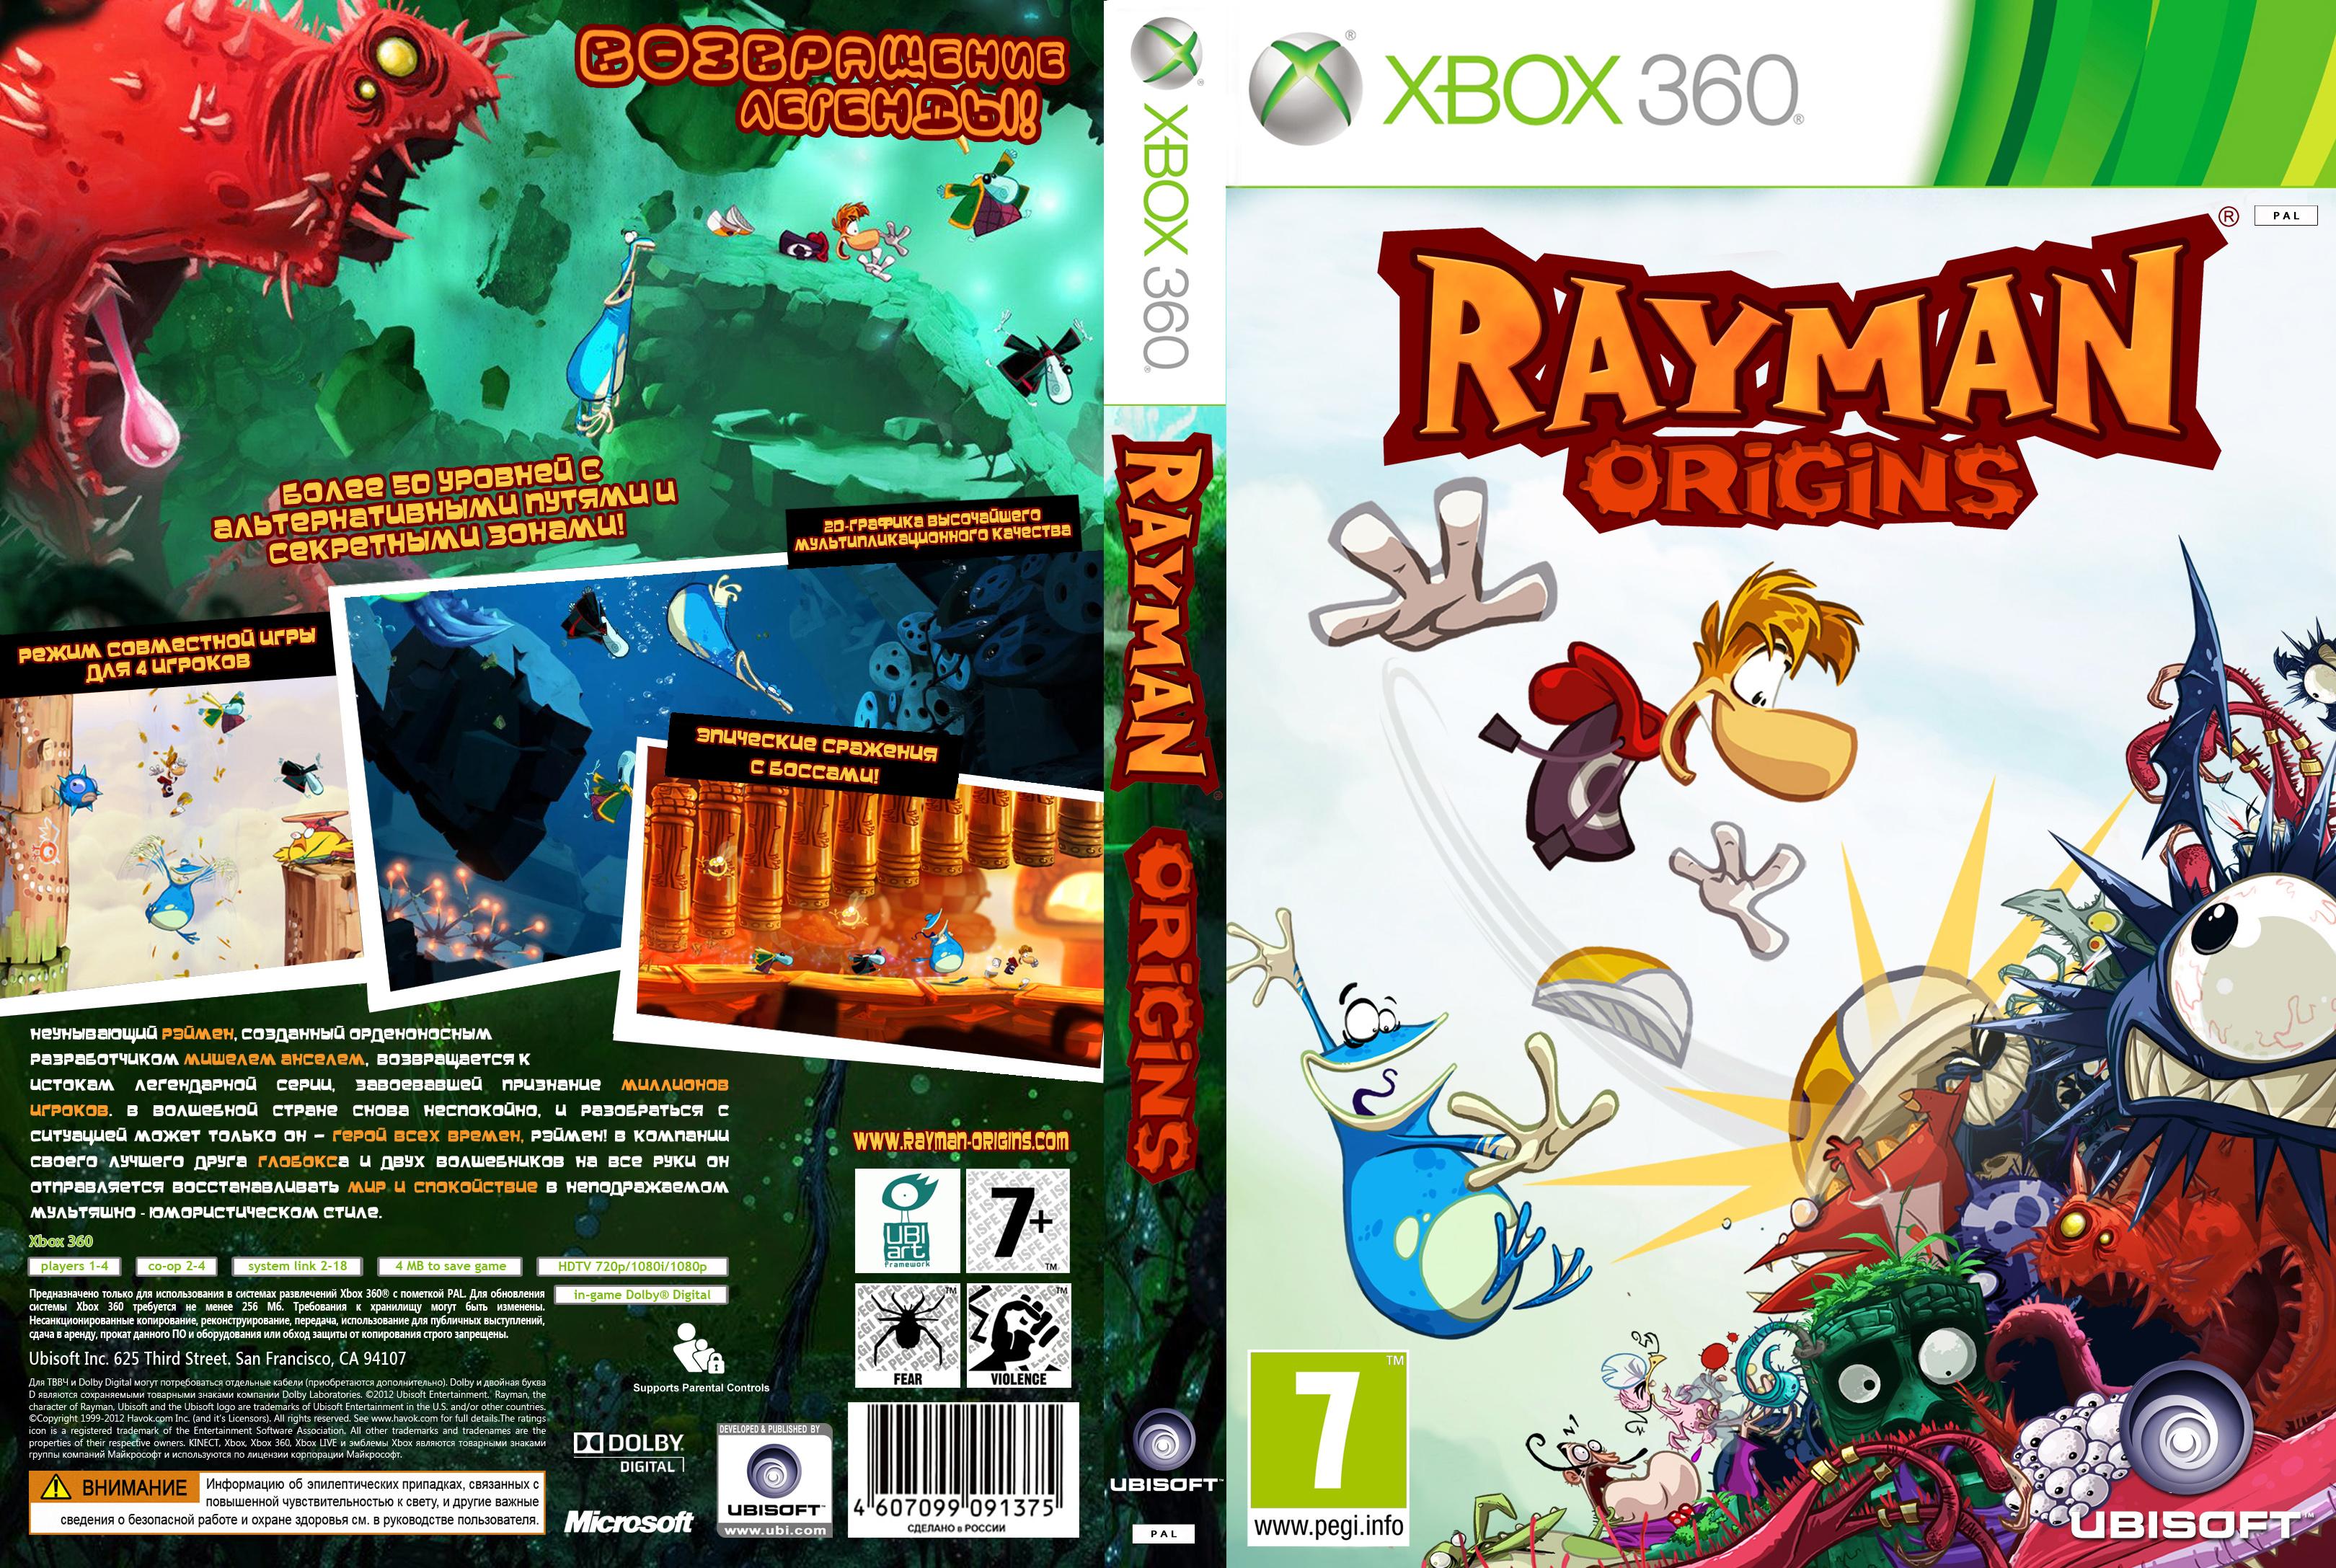 [covrik.com]Rayman Origins Xbox 360.jpg